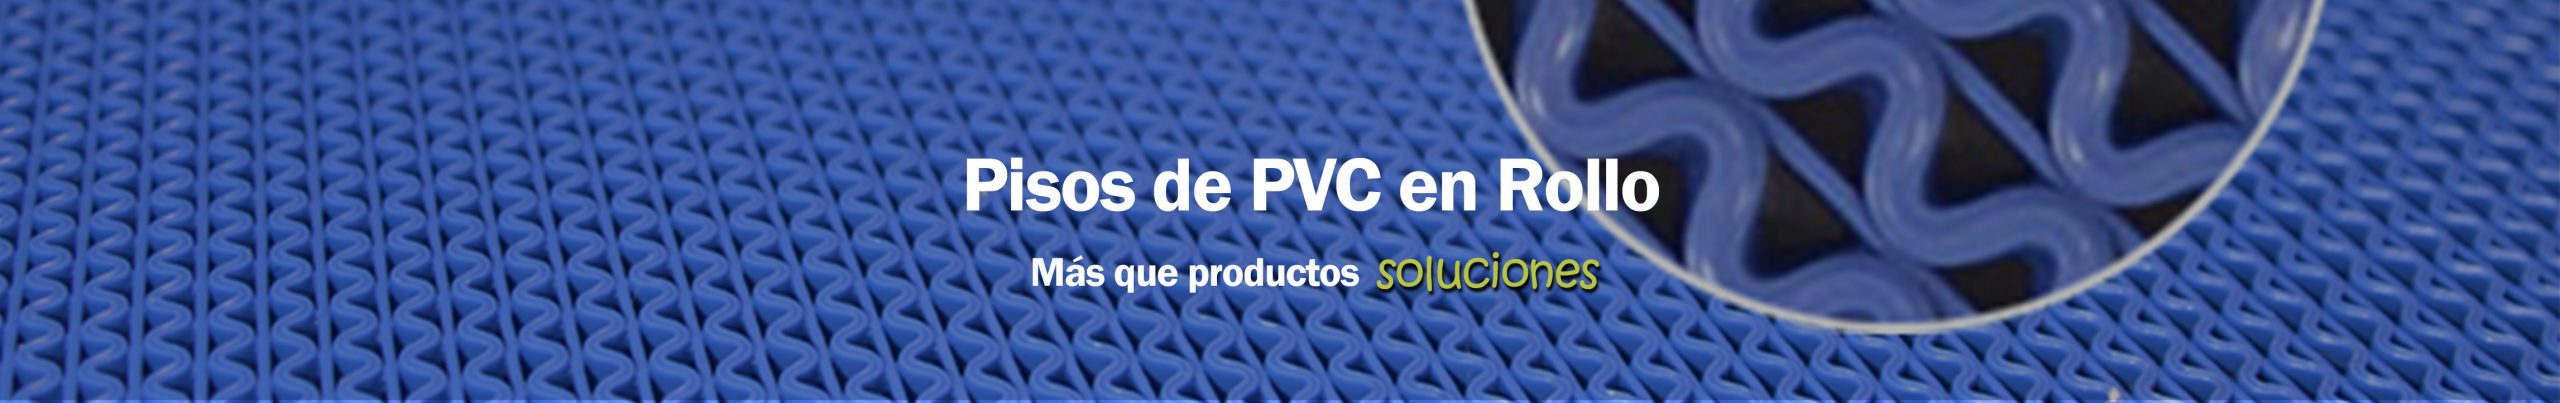 Piso de PVC en rollo1